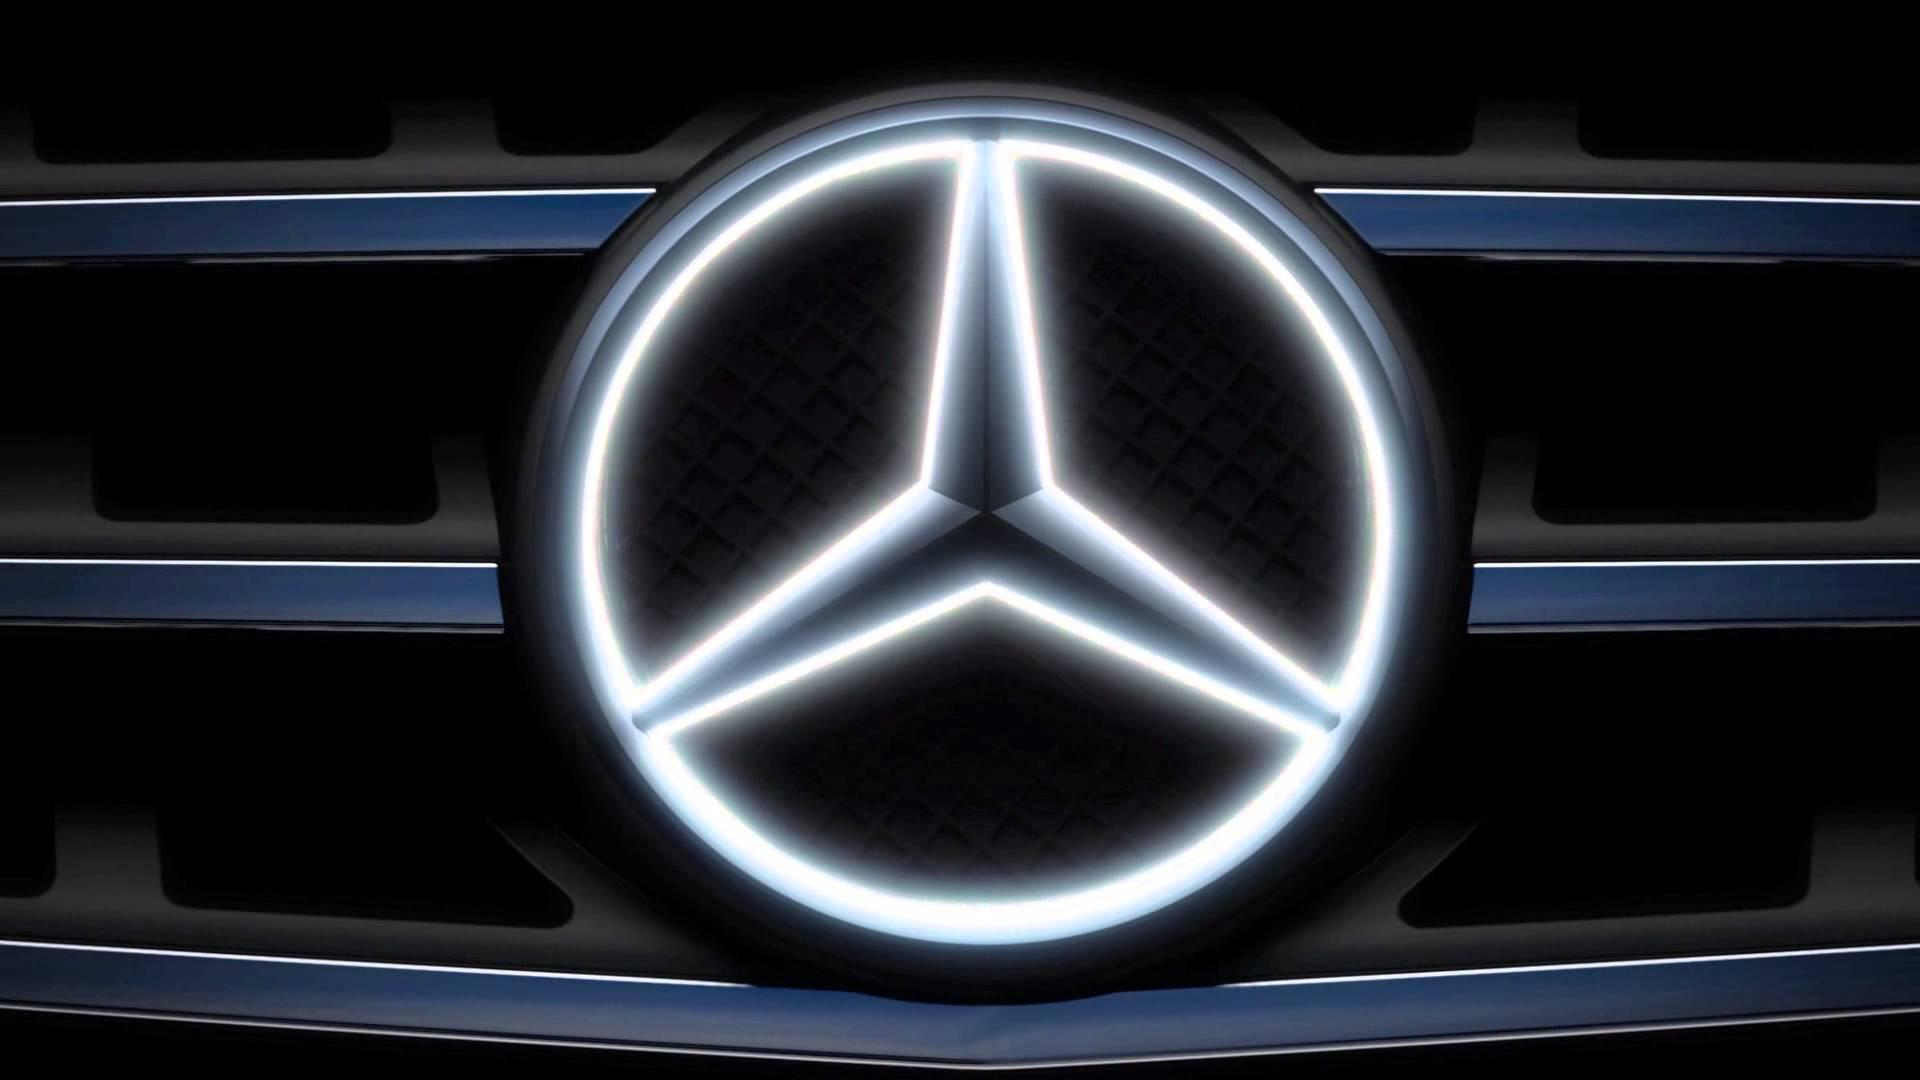 Mercedes Logo Wallpapers 1920x1080